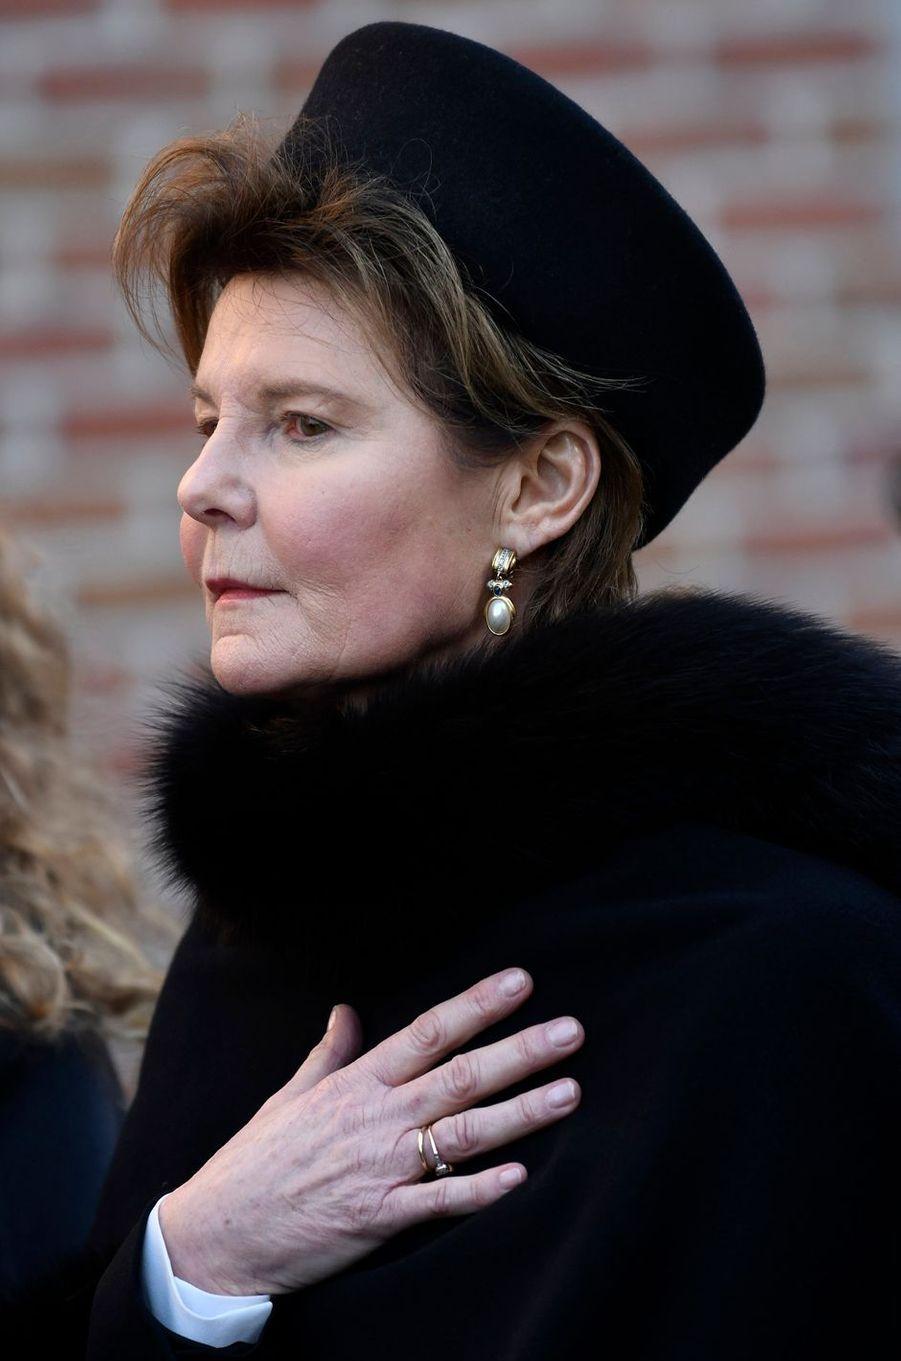 La princesseMargaretha de Liechtenstein, à Beloeil le 16 février 2019